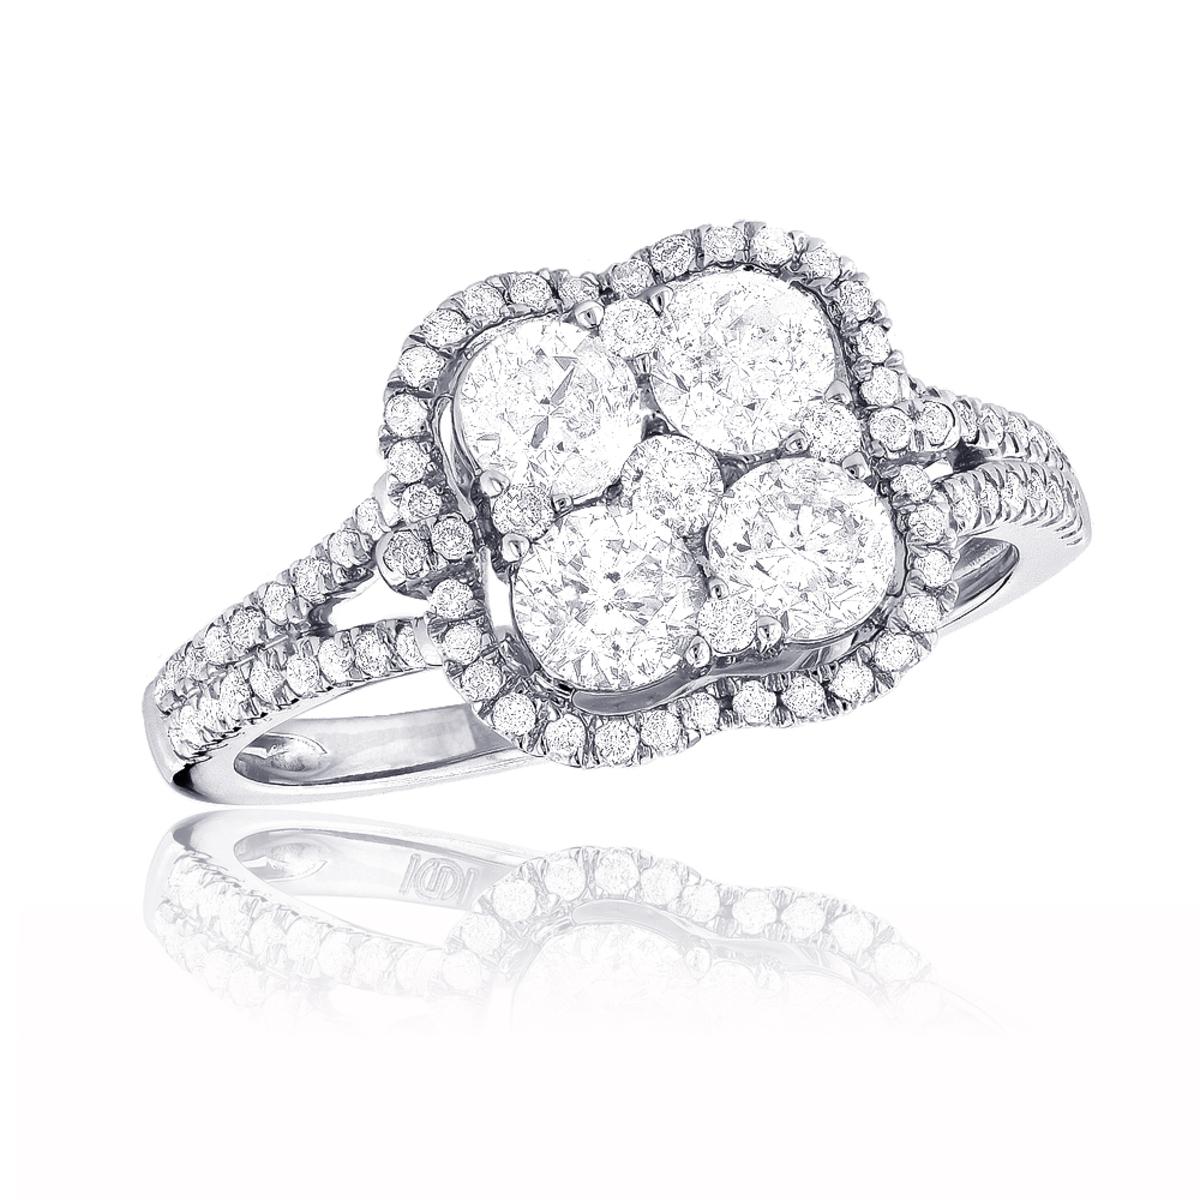 14K Gold Ladies Diamond Cluster Ring 1.8ct Unique Halo Engagement Ring